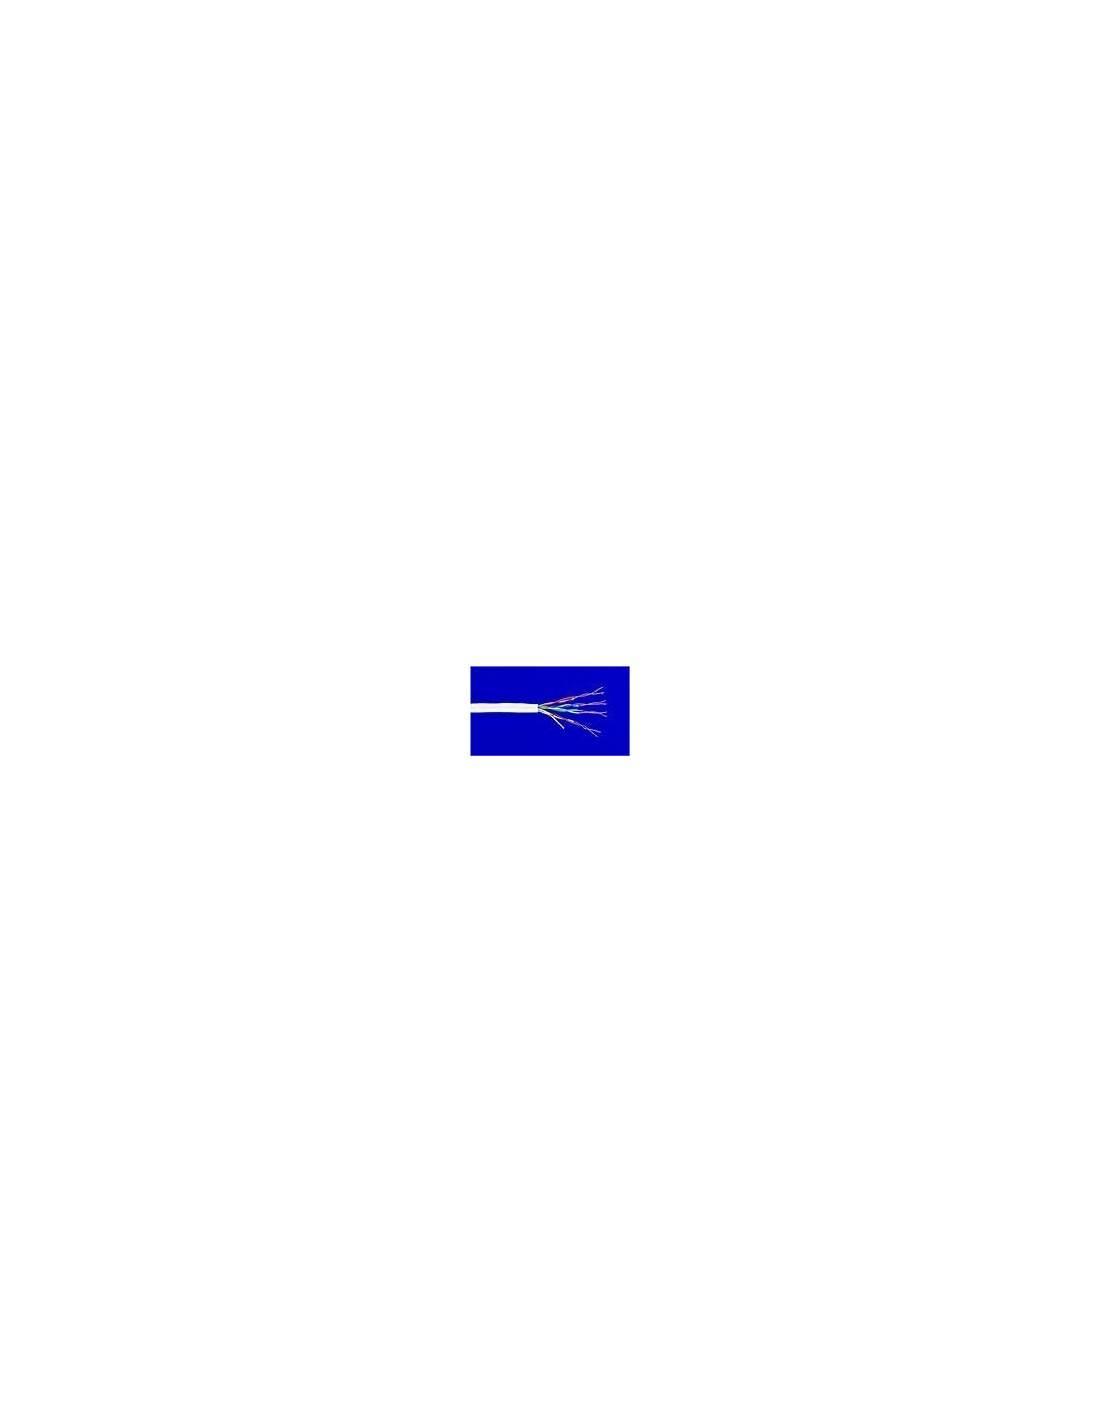 Atemberaubend Ethernet Kabelschaltplan 568b Ideen - Der Schaltplan ...